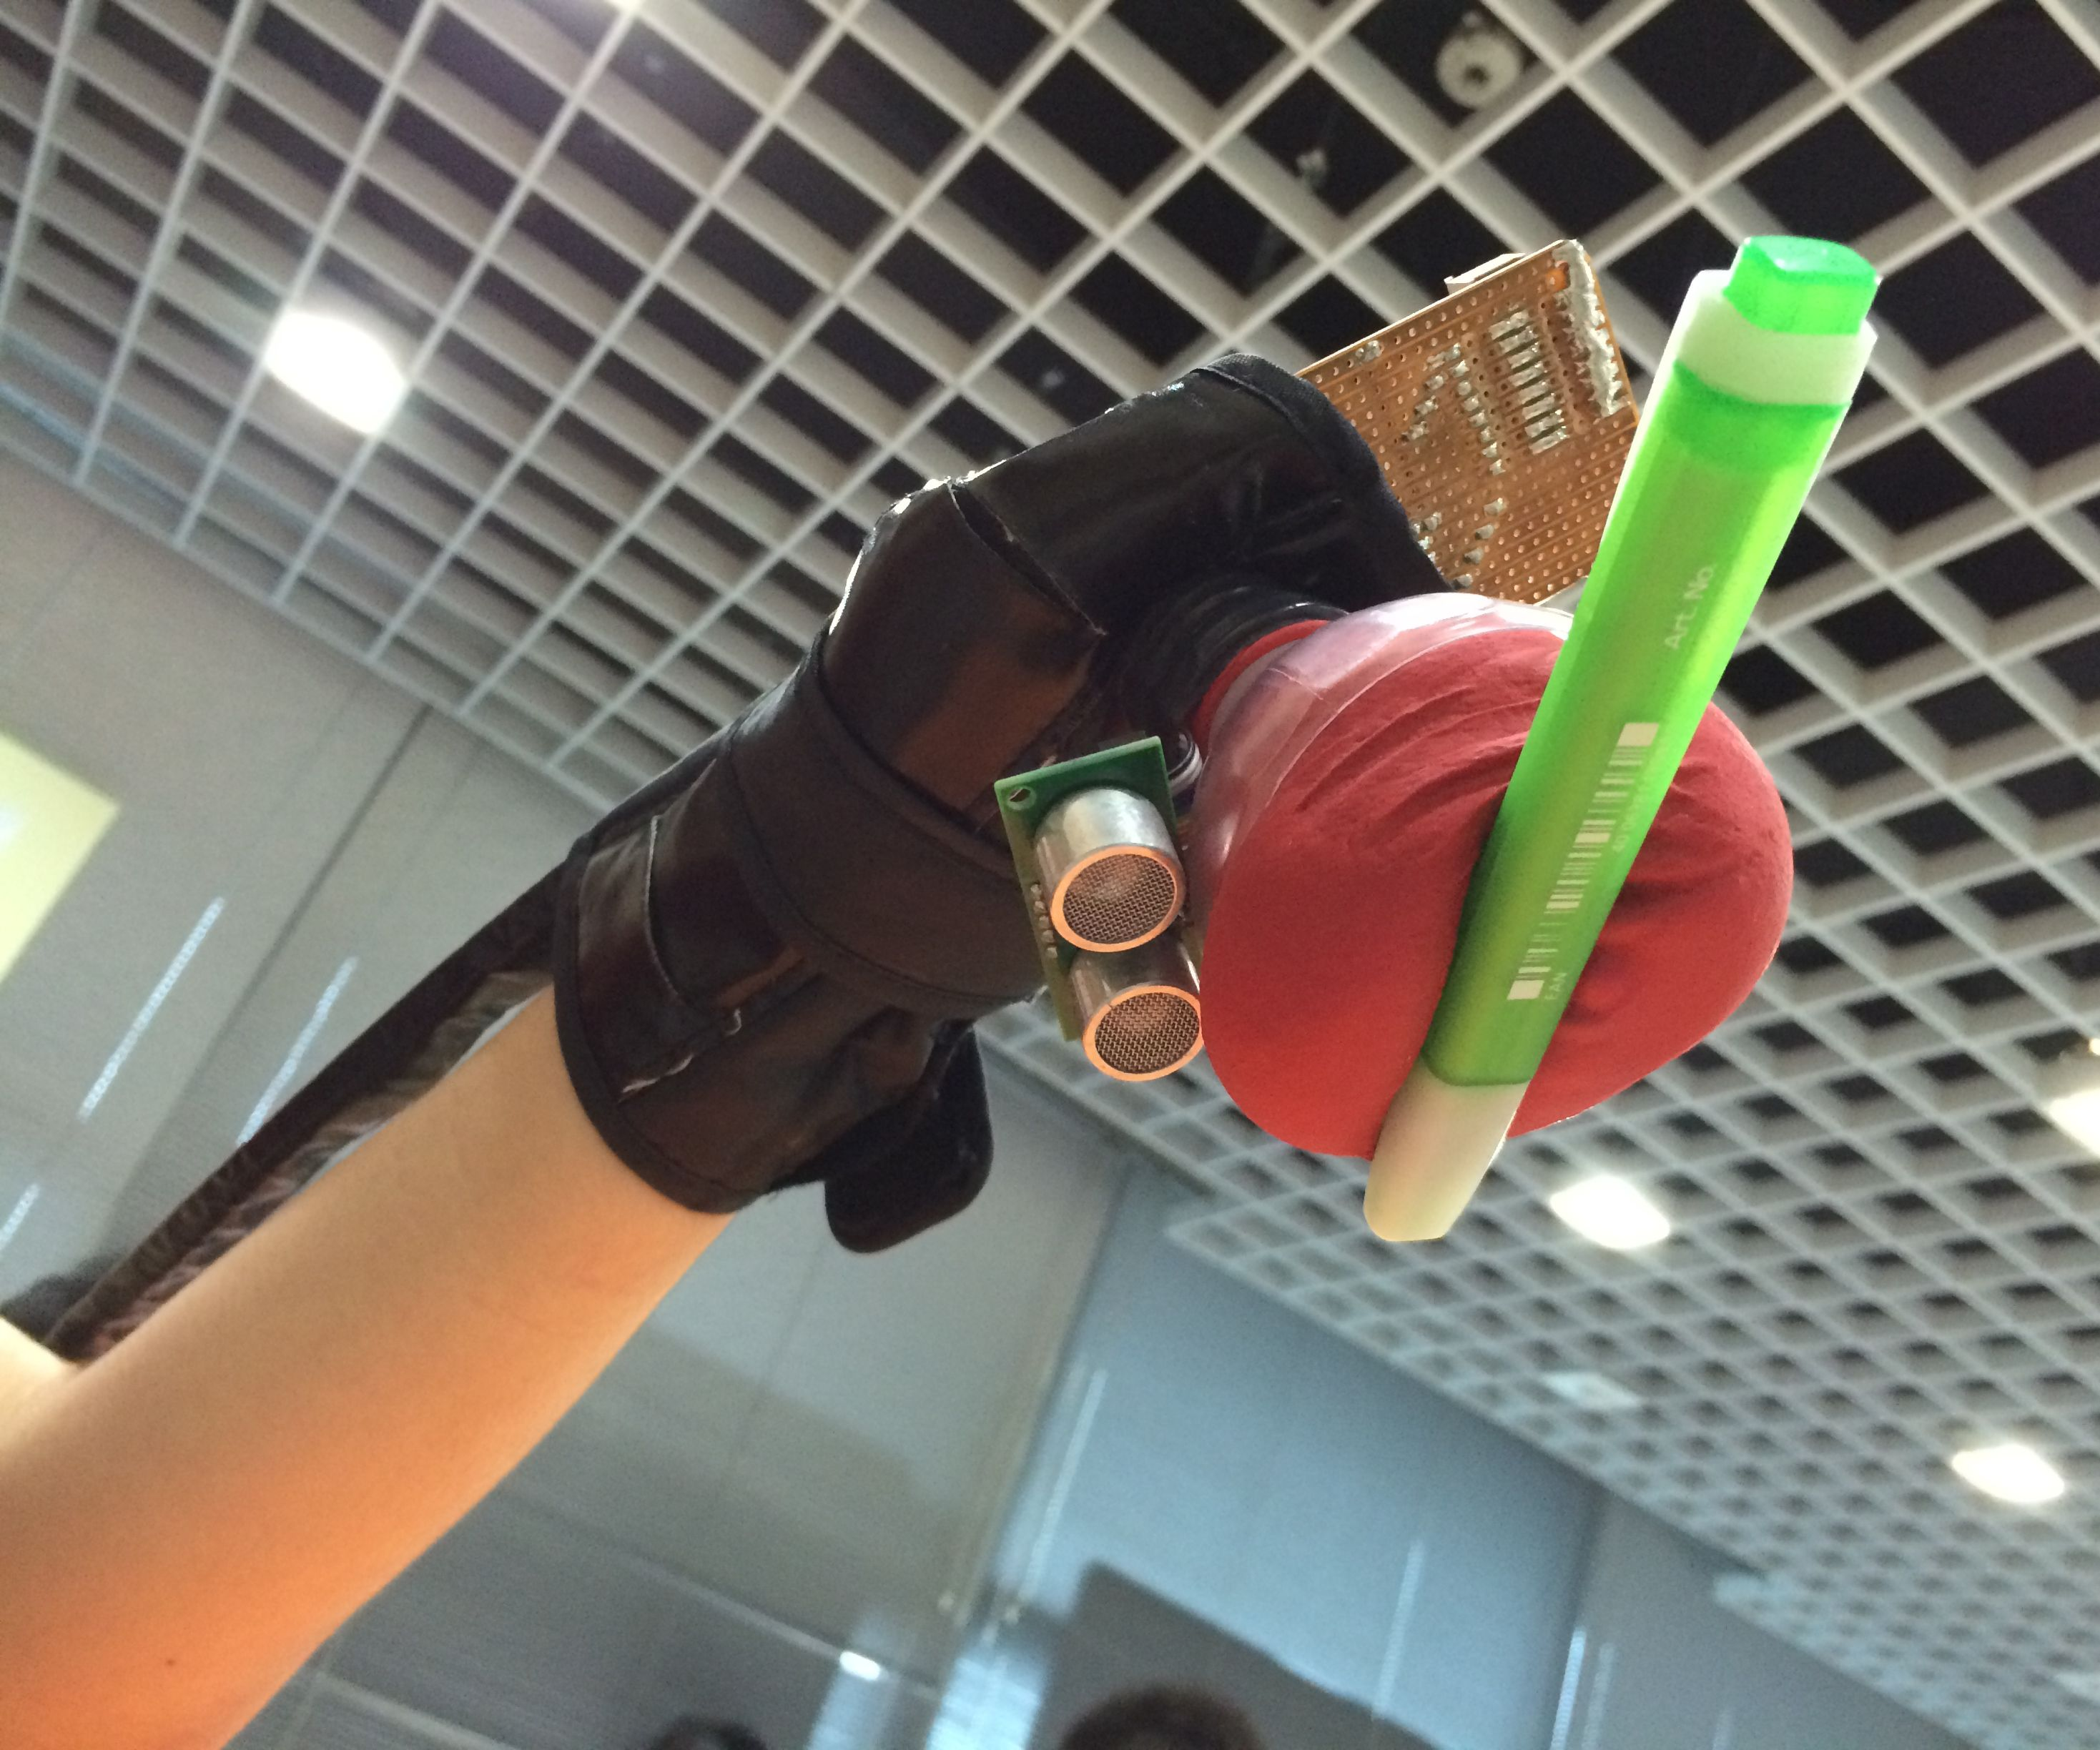 Wearable Assistive Tech Gripper: Doraemon's Hand